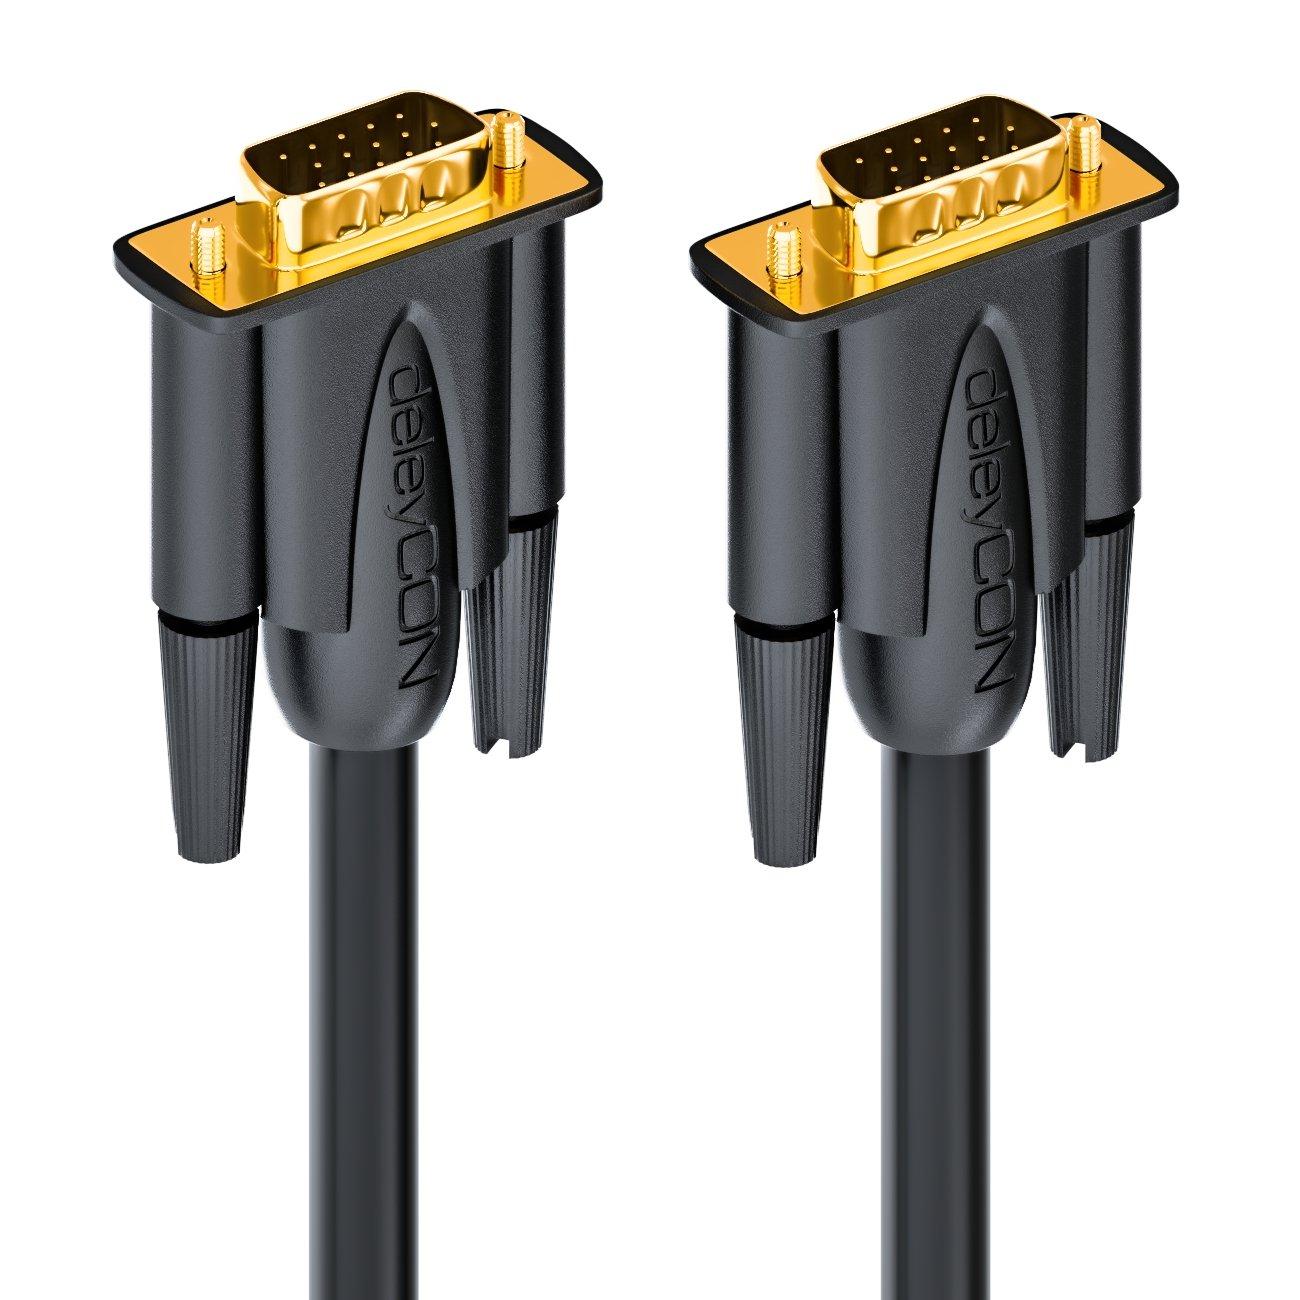 deleyCON 20m VGA Kabel 15pol S-VGA Monitorkabel D-Sub-Stecker 1080p Full HD 3-Fach geschirmt Knickschutz vergoldete Kontakte Schwarz